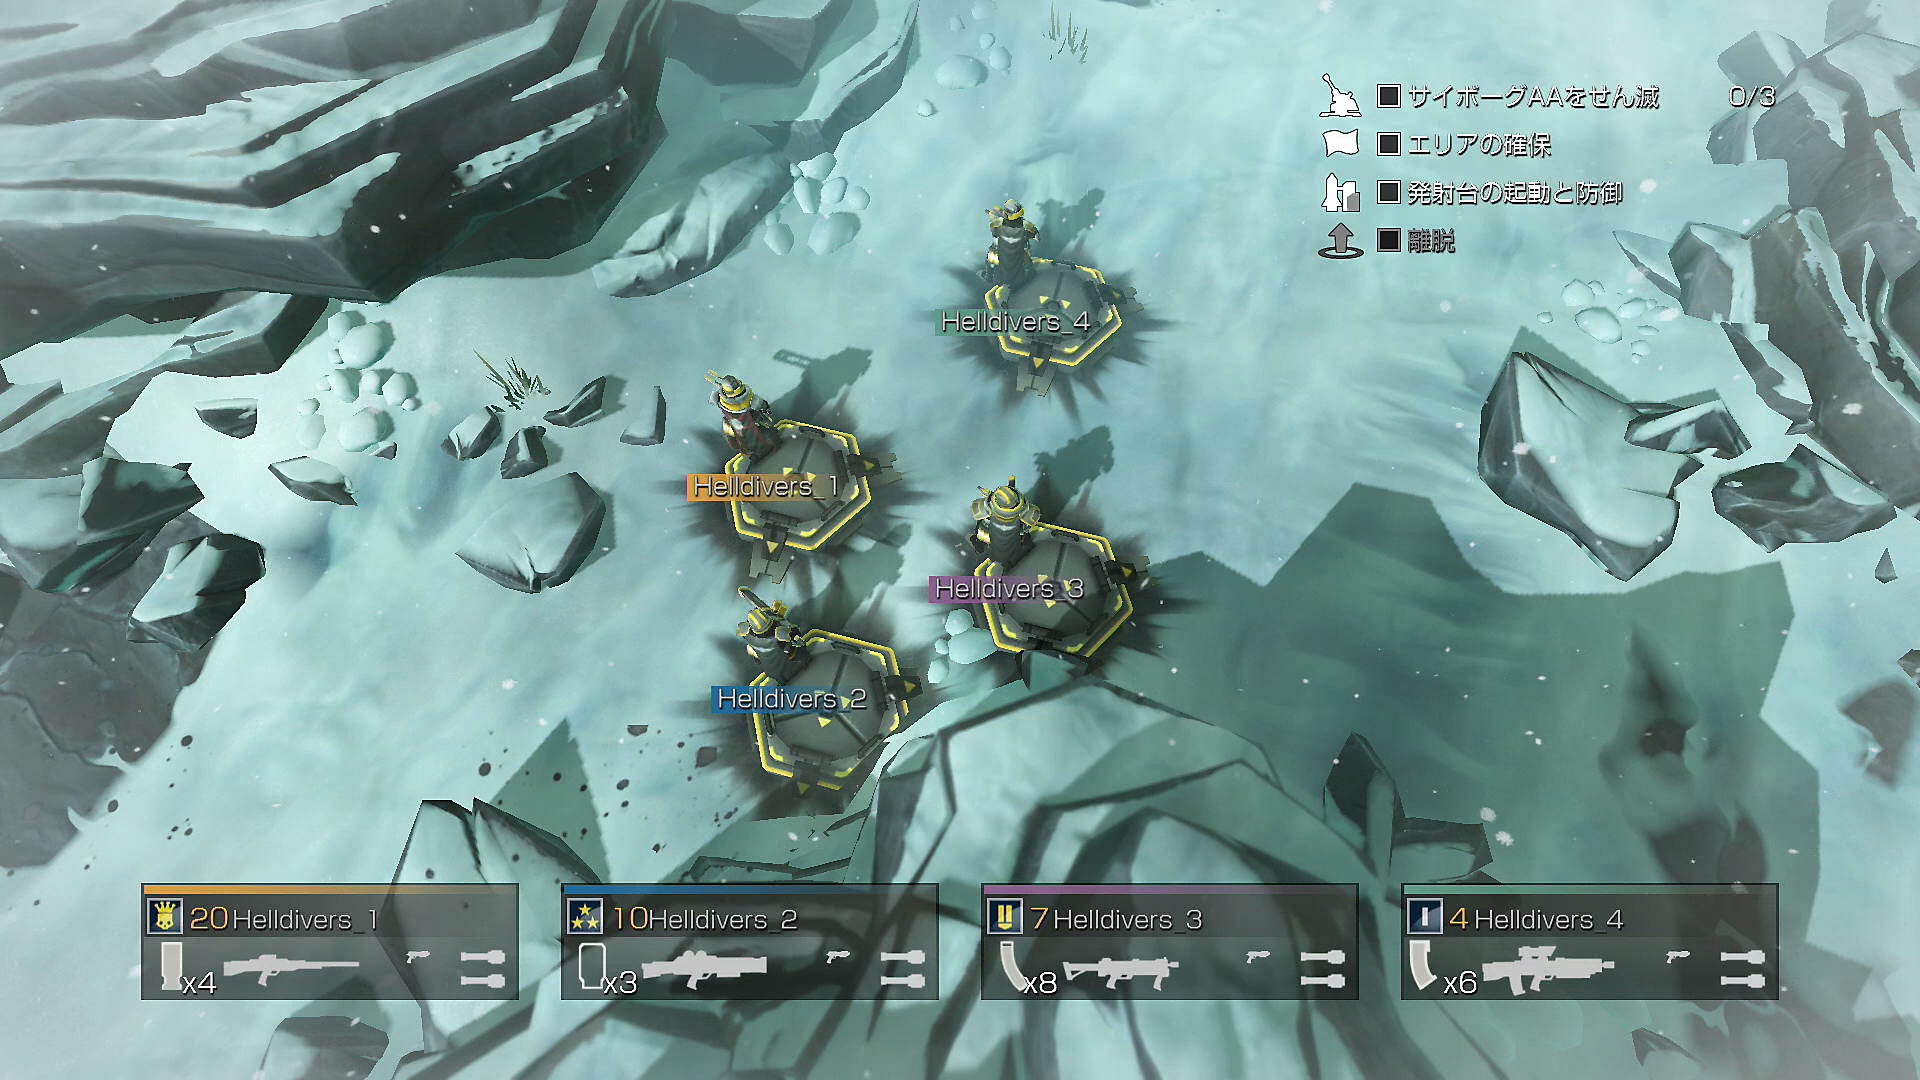 HELLDIVERS - Gallery Screenshot 3